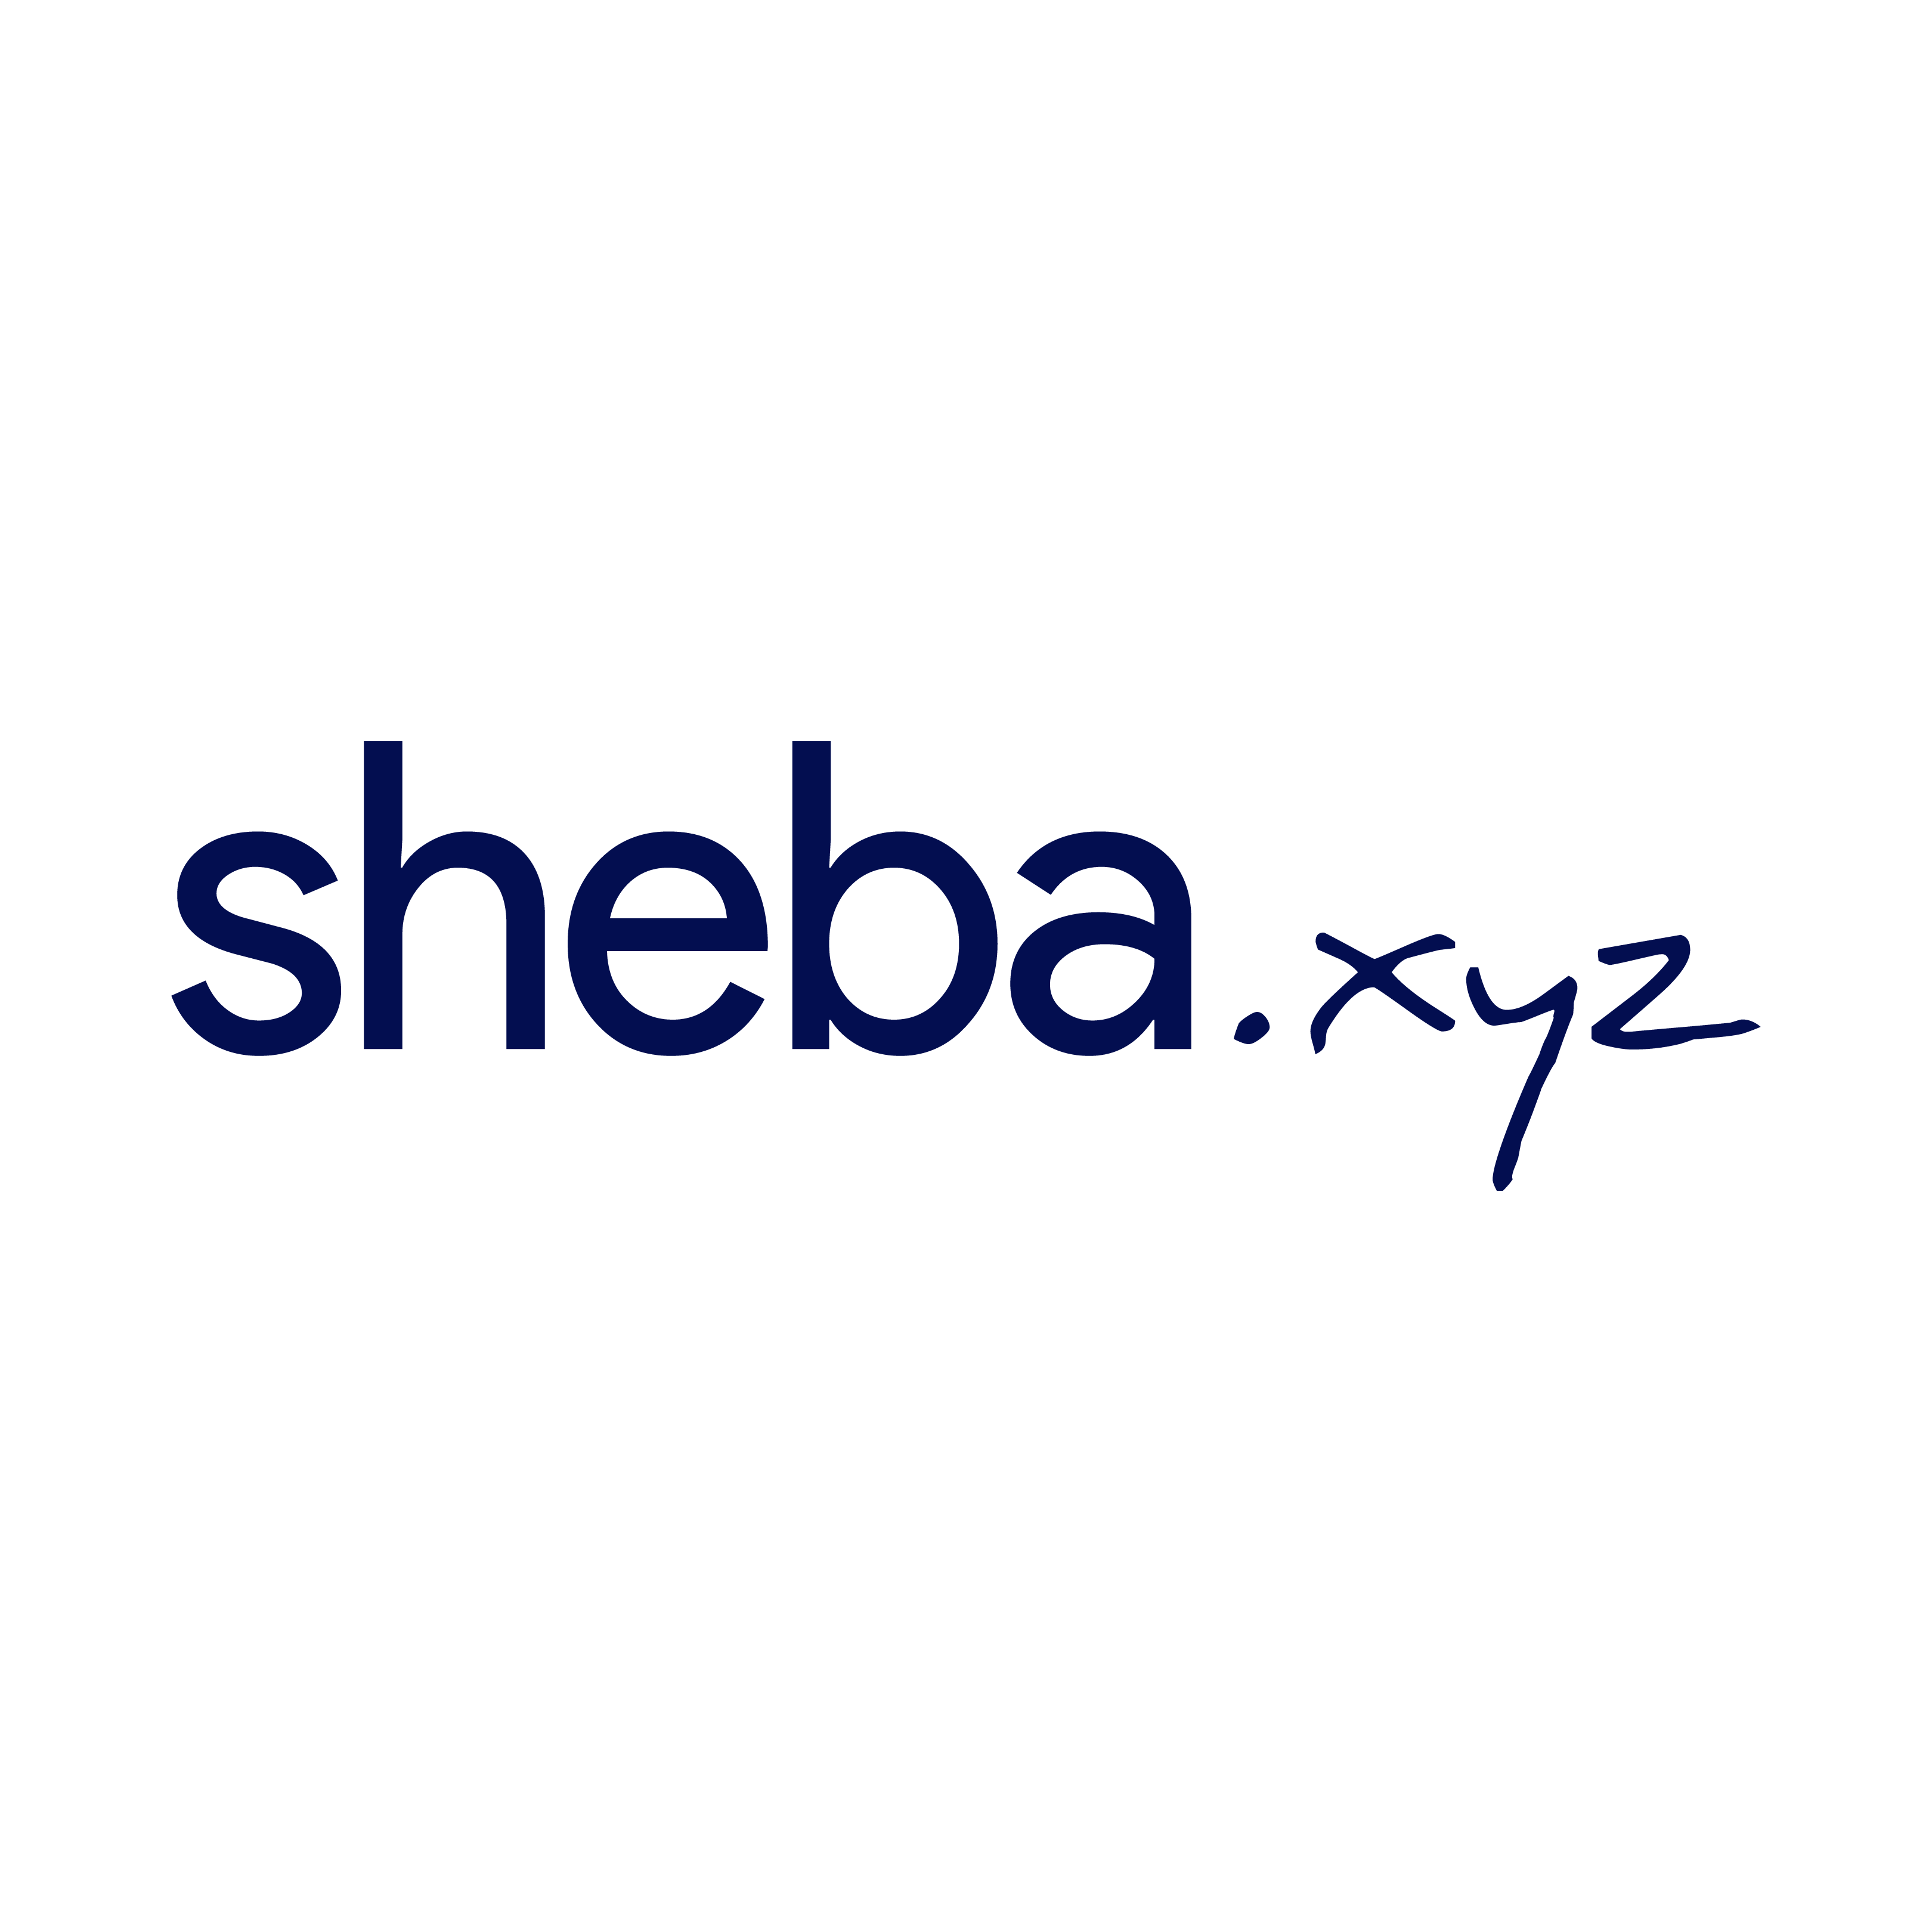 https://assets.roar.media/assets/JiJClM4K7PrTHA1o_Sheba-Logo.png